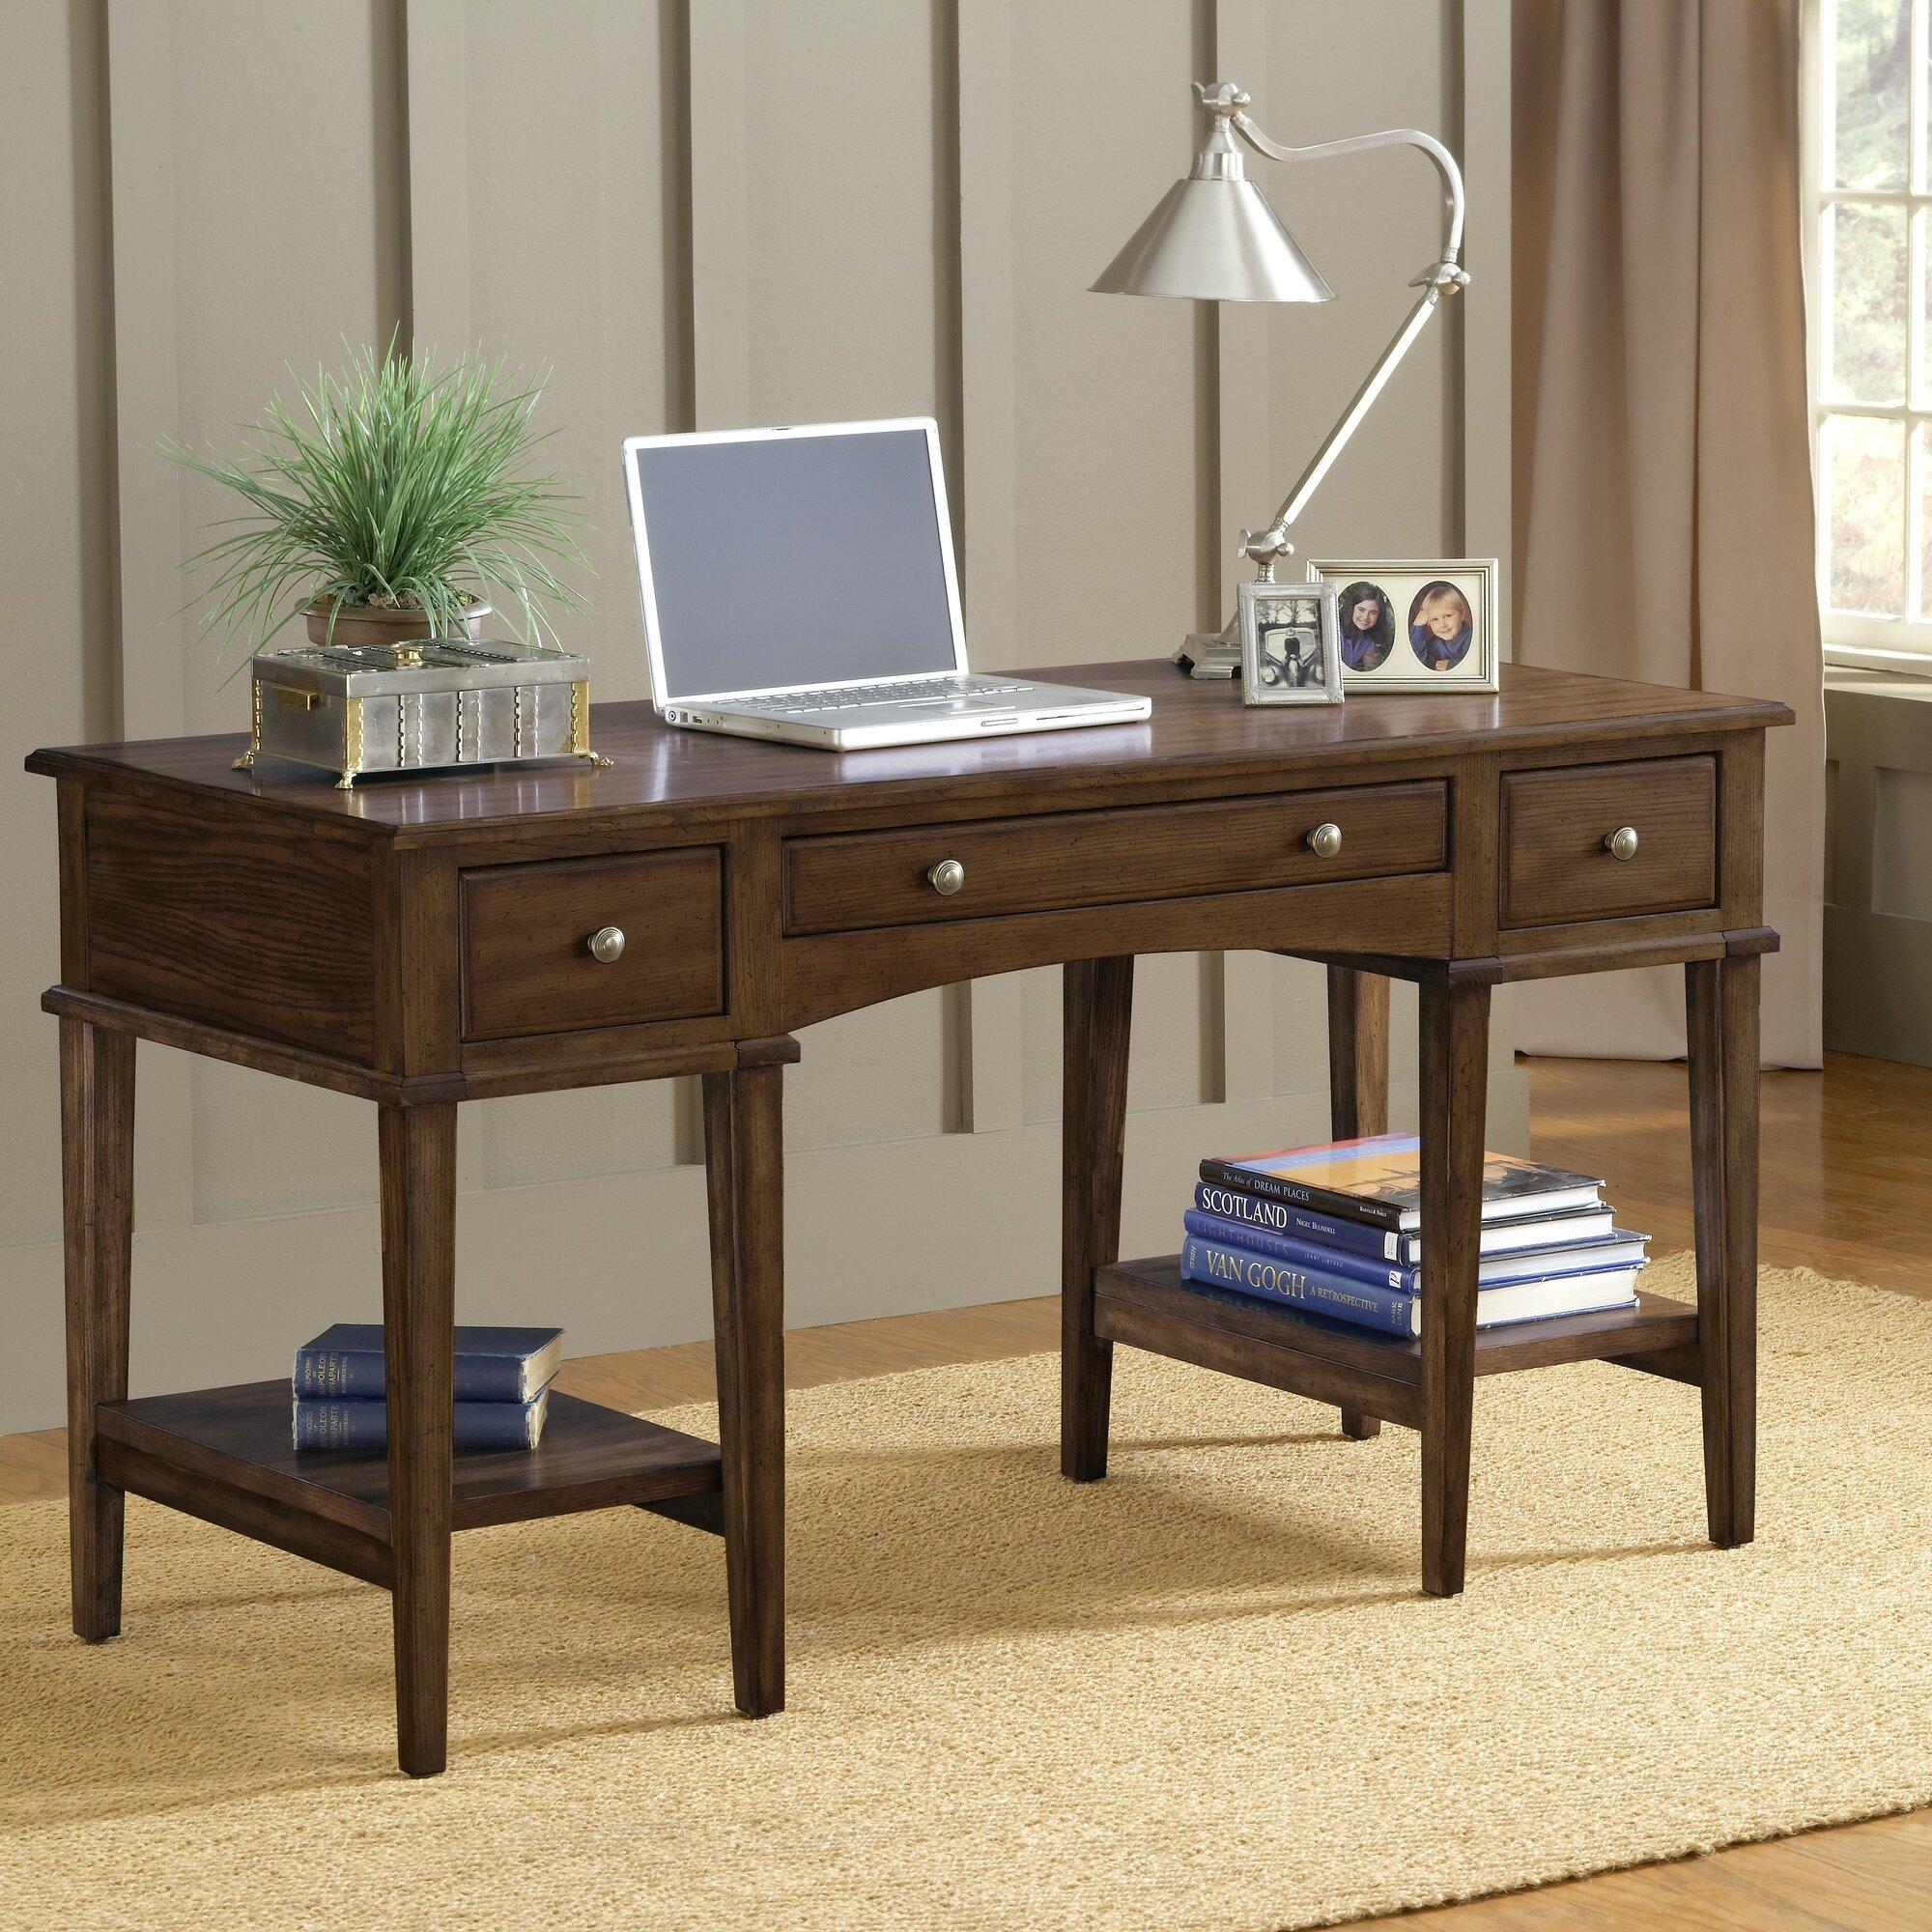 Elegant Desk Galore Interior Design And Home Inspiration